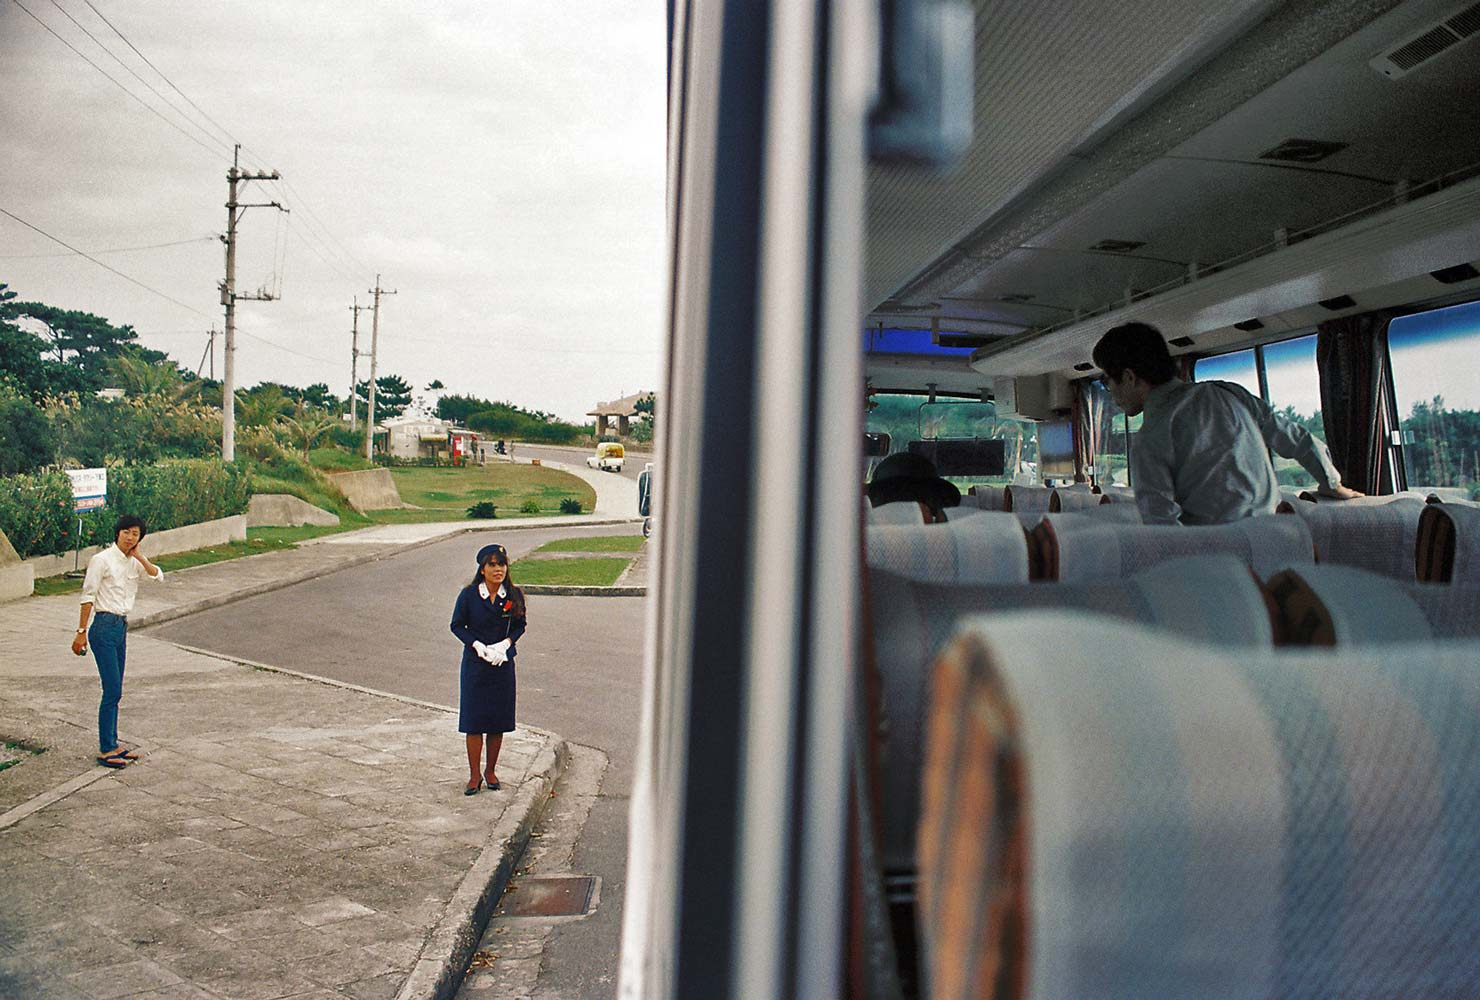 Tour bus, Okinawa